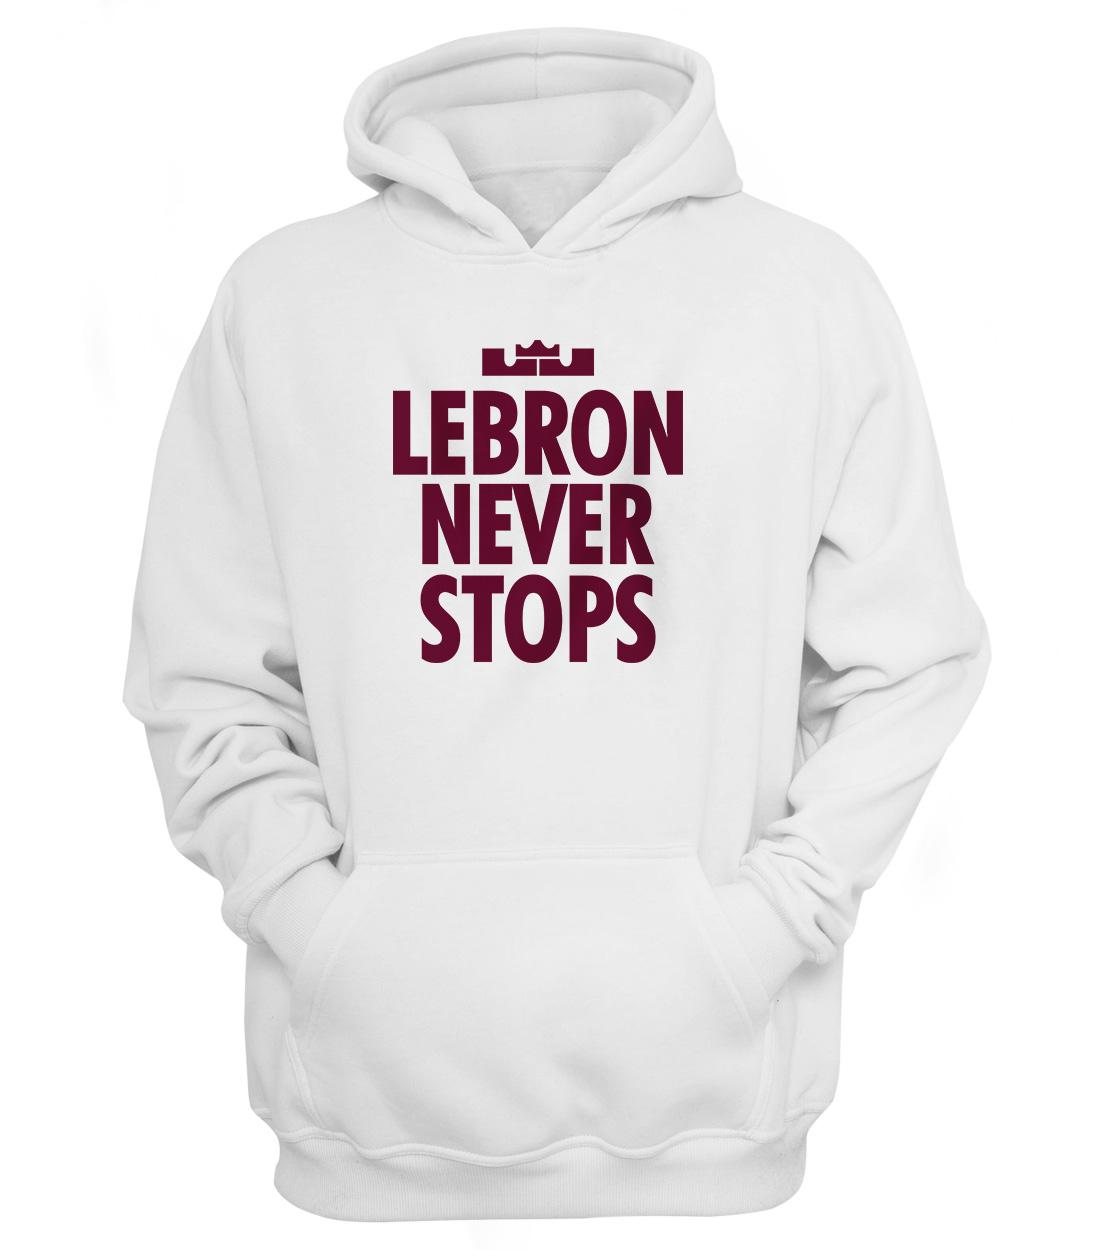 Lebron Never Stops Hoodie (HD-WHT-NP-130-PLYR-LAL-LEBRON.NVR.STP.)